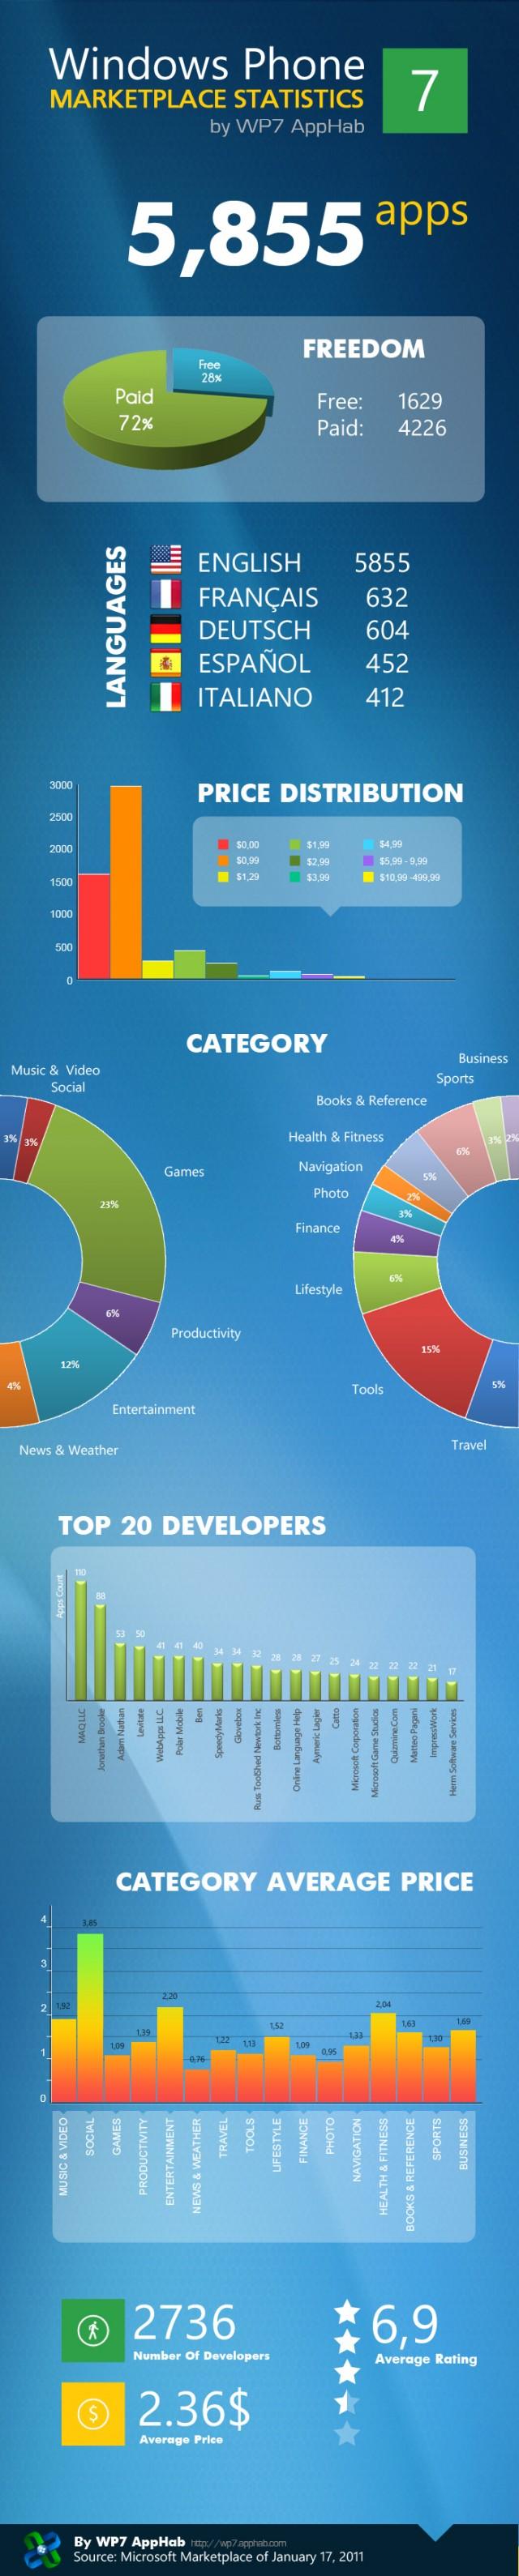 infographic windows phone 7 marketplace   the world of